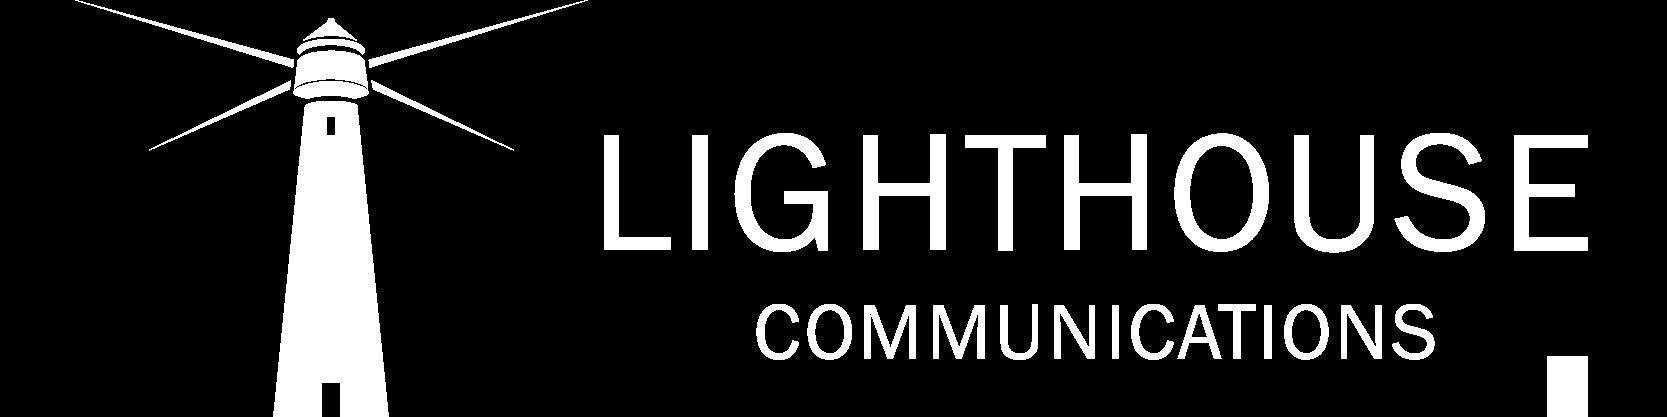 Lighthouse Communications